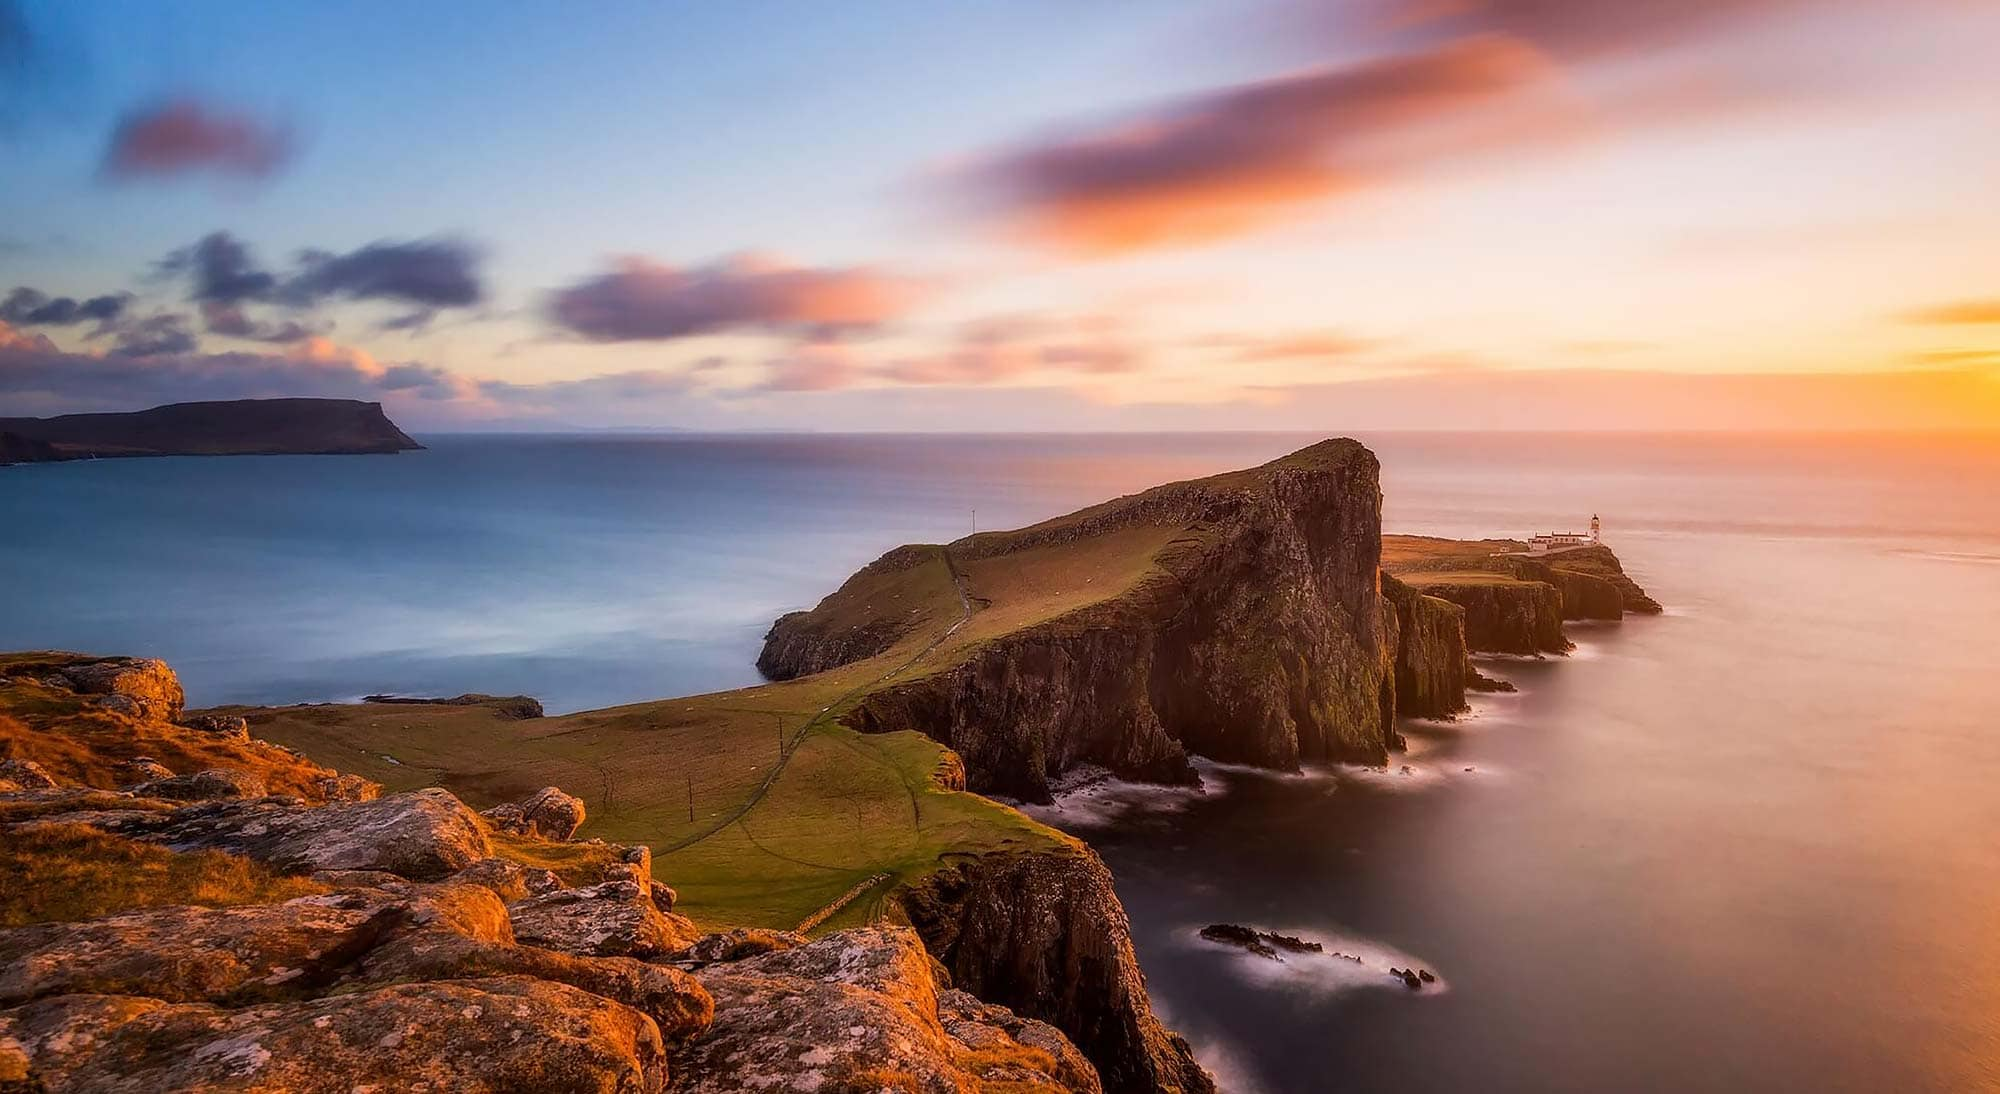 viaggio fotografico Inghilterra Devon